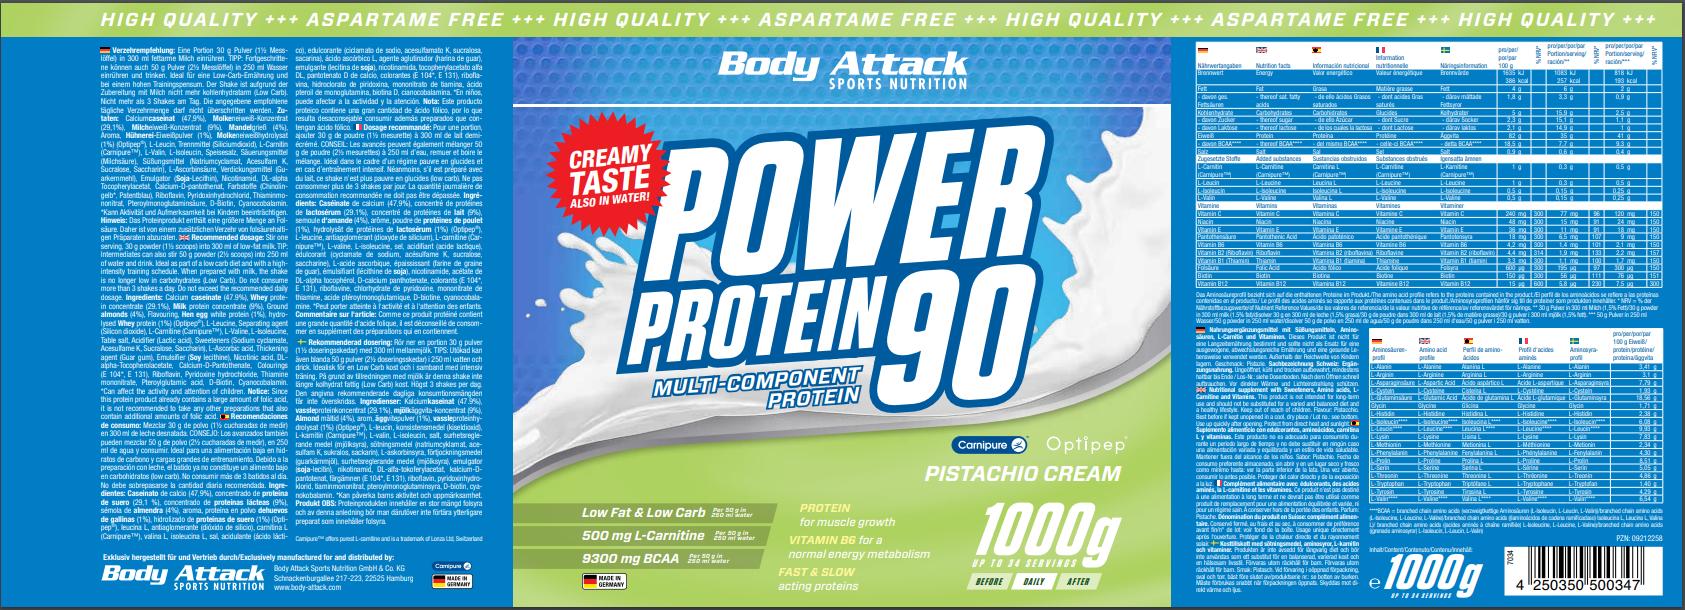 Power Proti 90 Pistachio